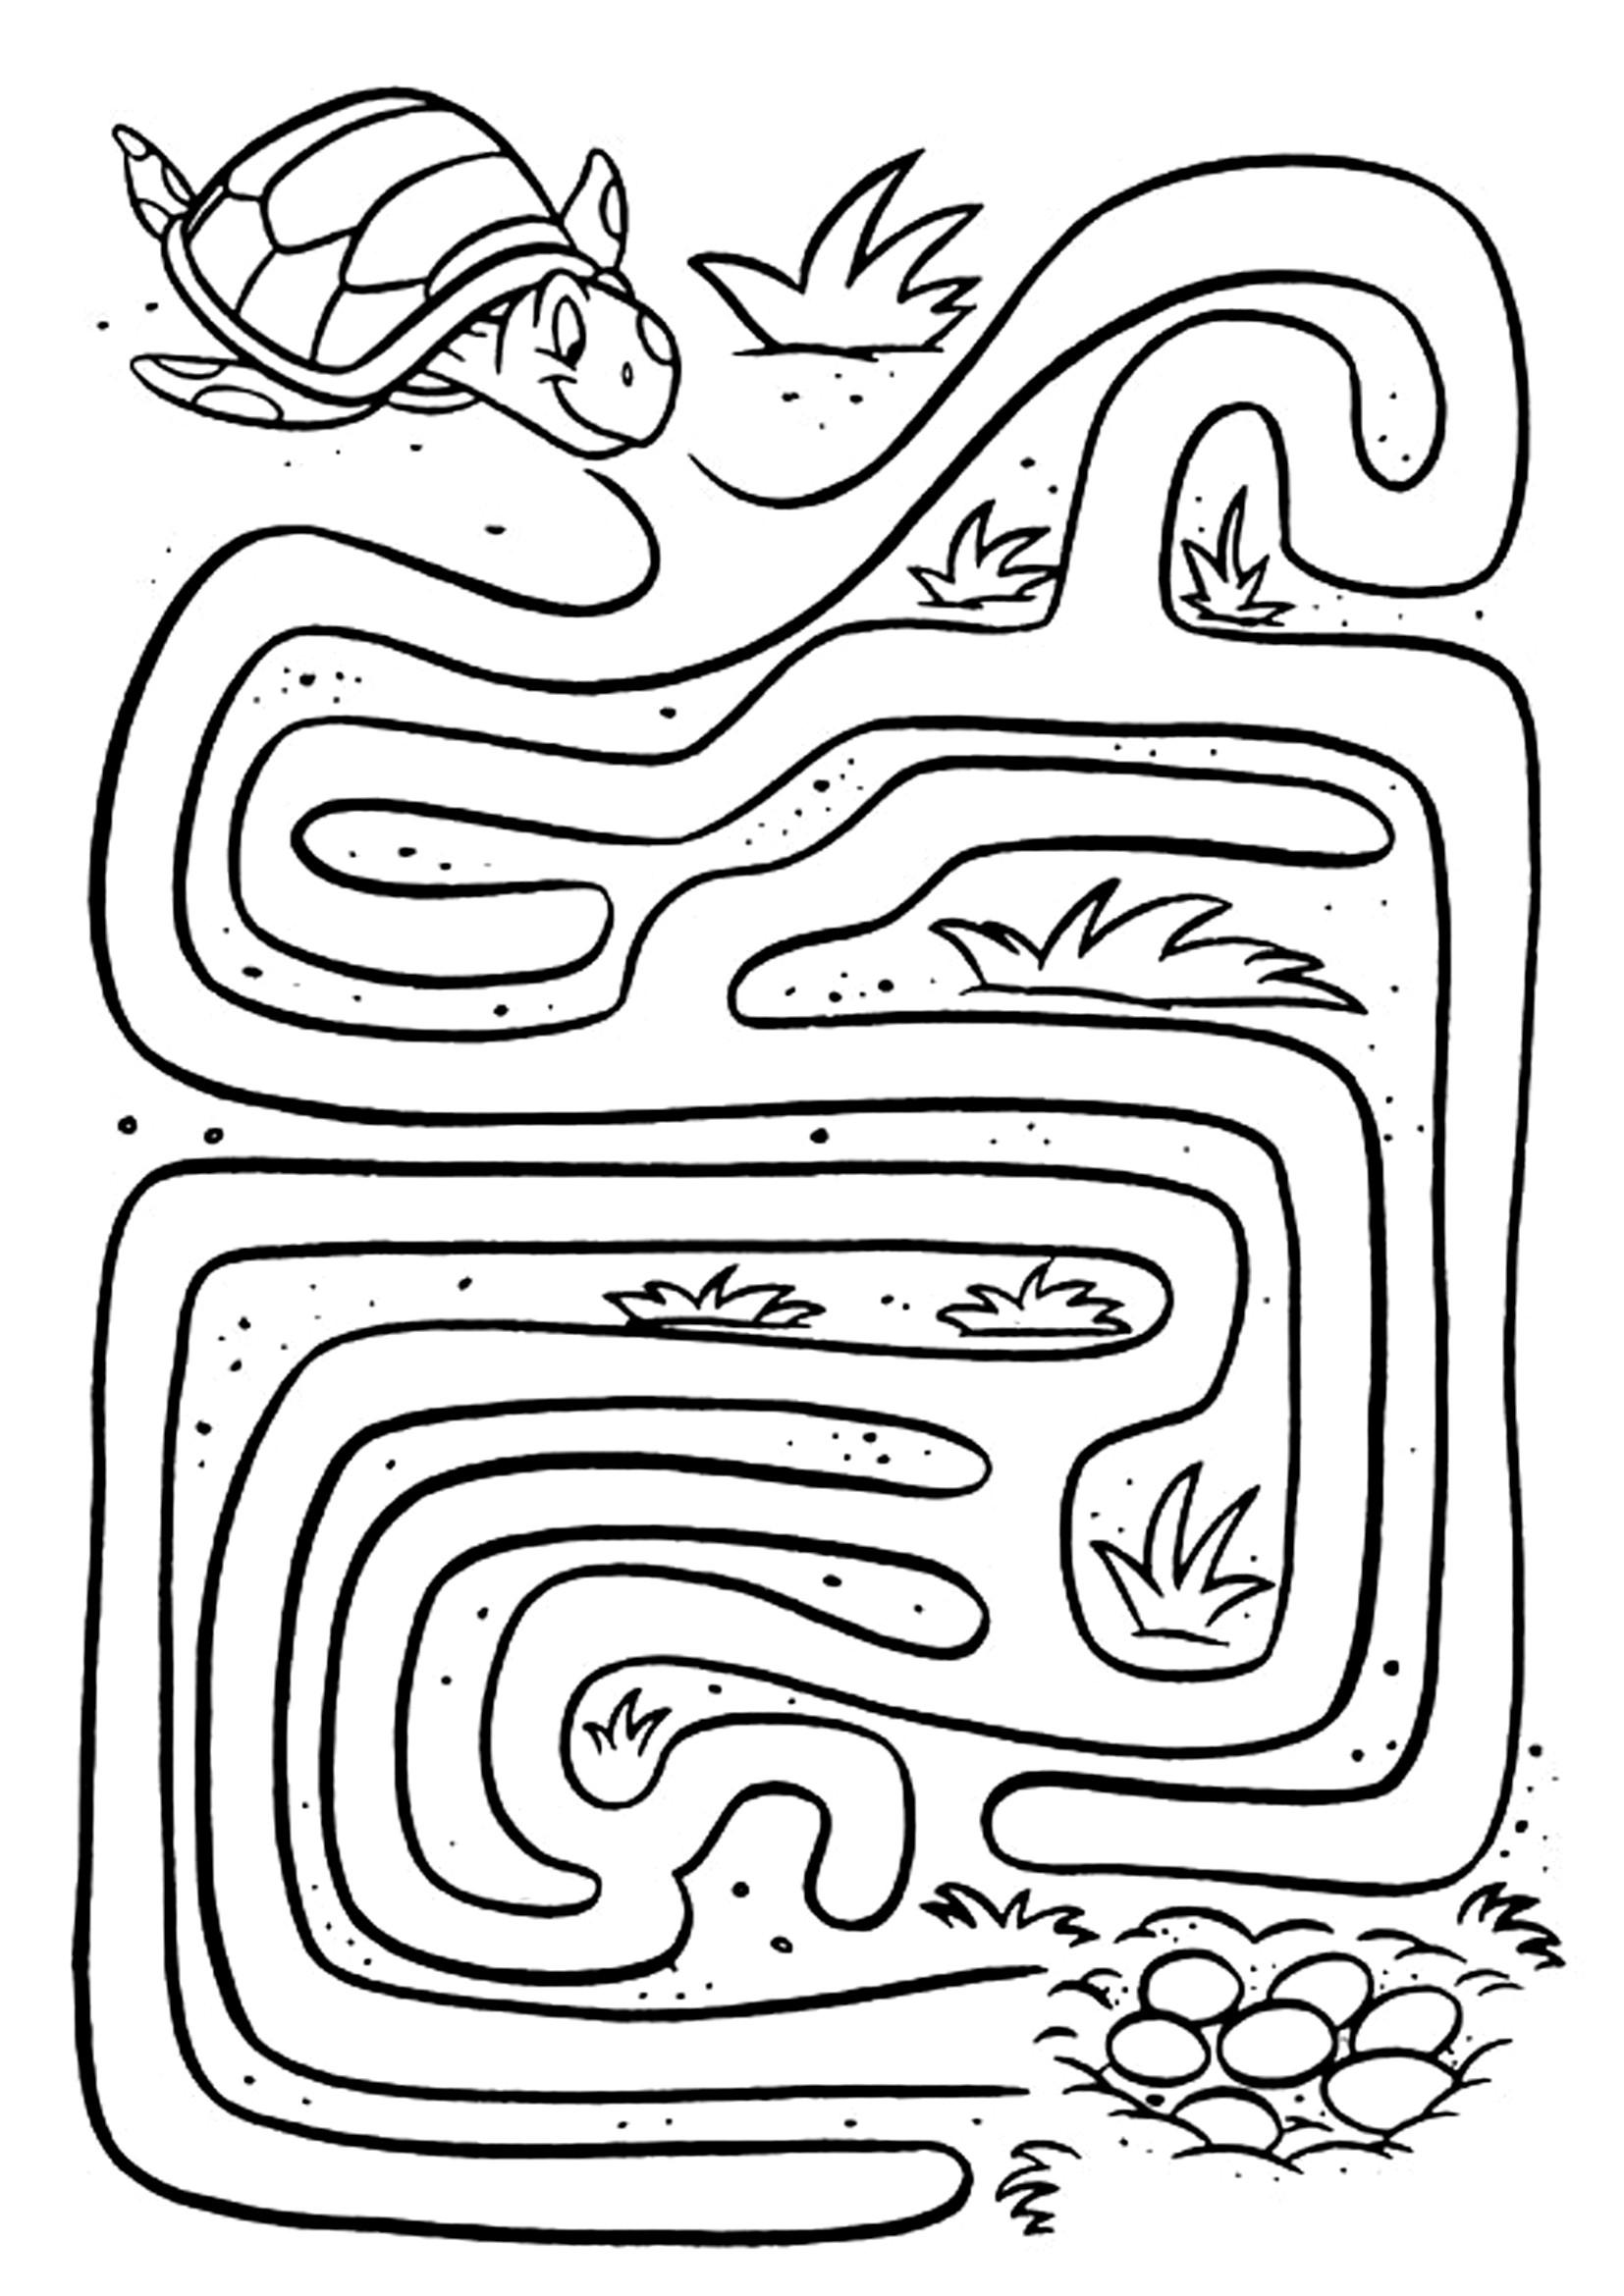 Groundhog Day Printable Coloring Pages At Getdrawings